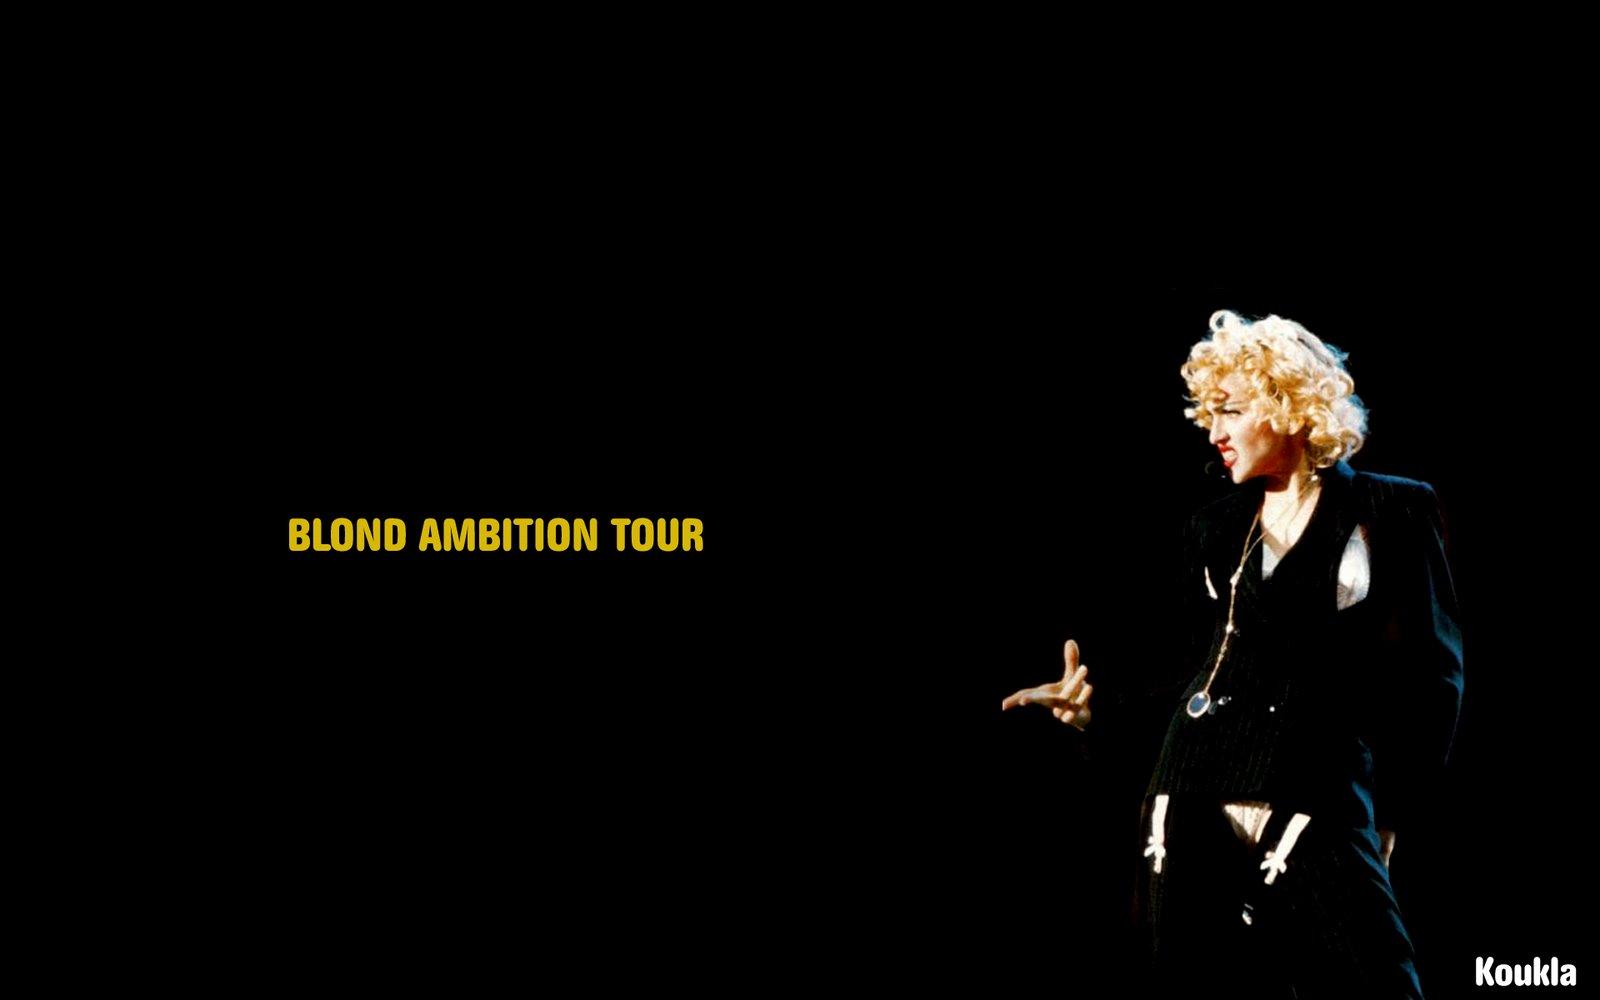 Blond Ambition Tour Wallpaper MADONNA FANMADE ARTWORKS 1600x1000